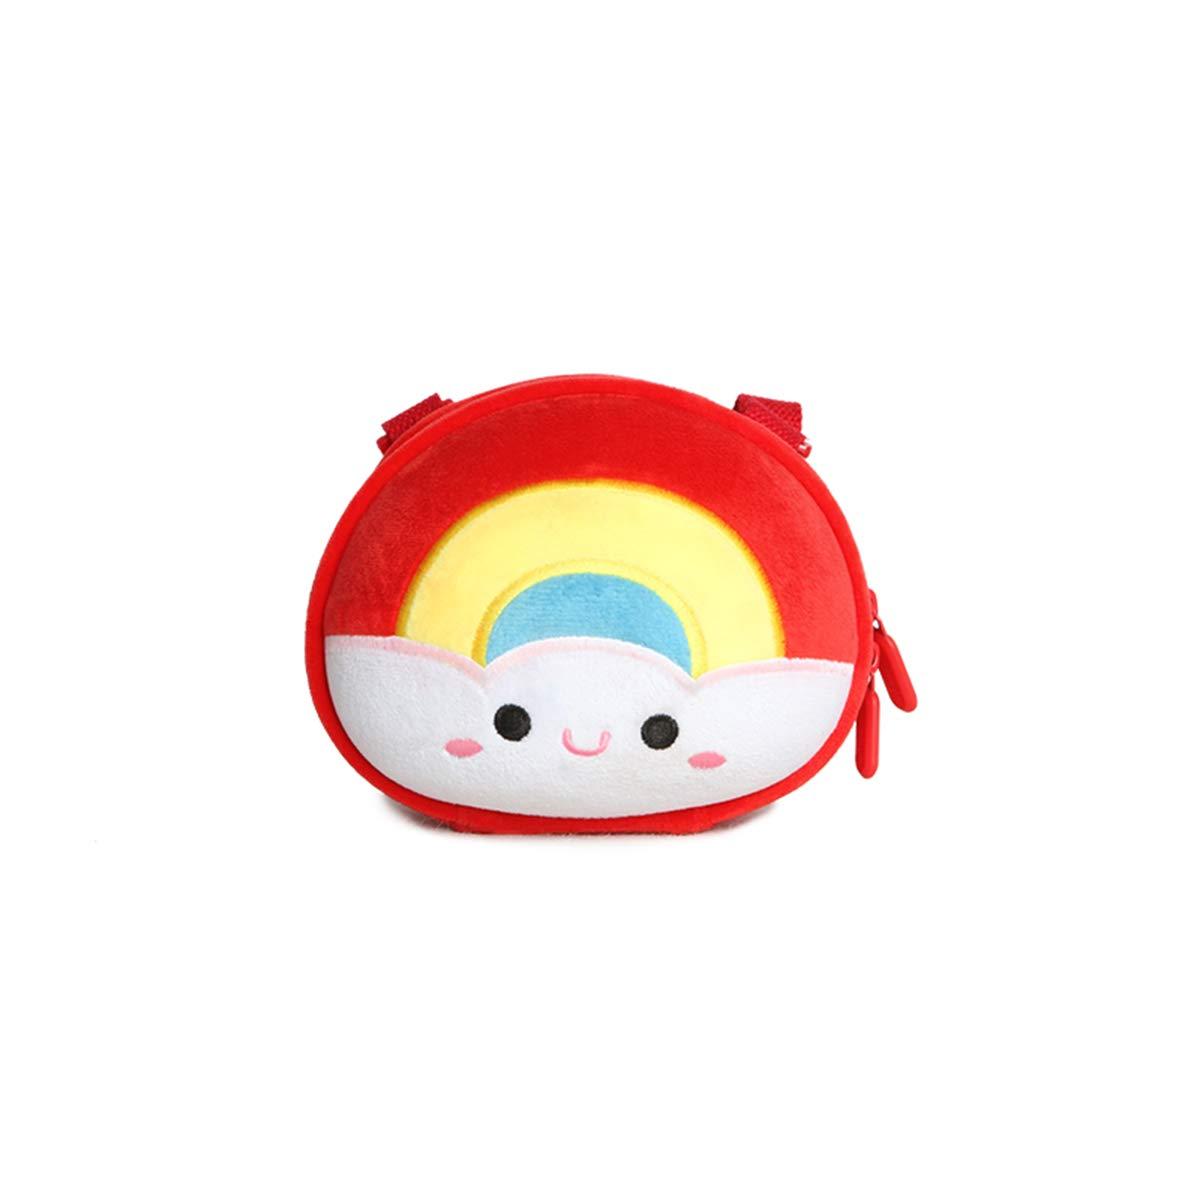 Supercute Crossbody Bag for Girls Outdoor Travel Small Purse Baby Girls